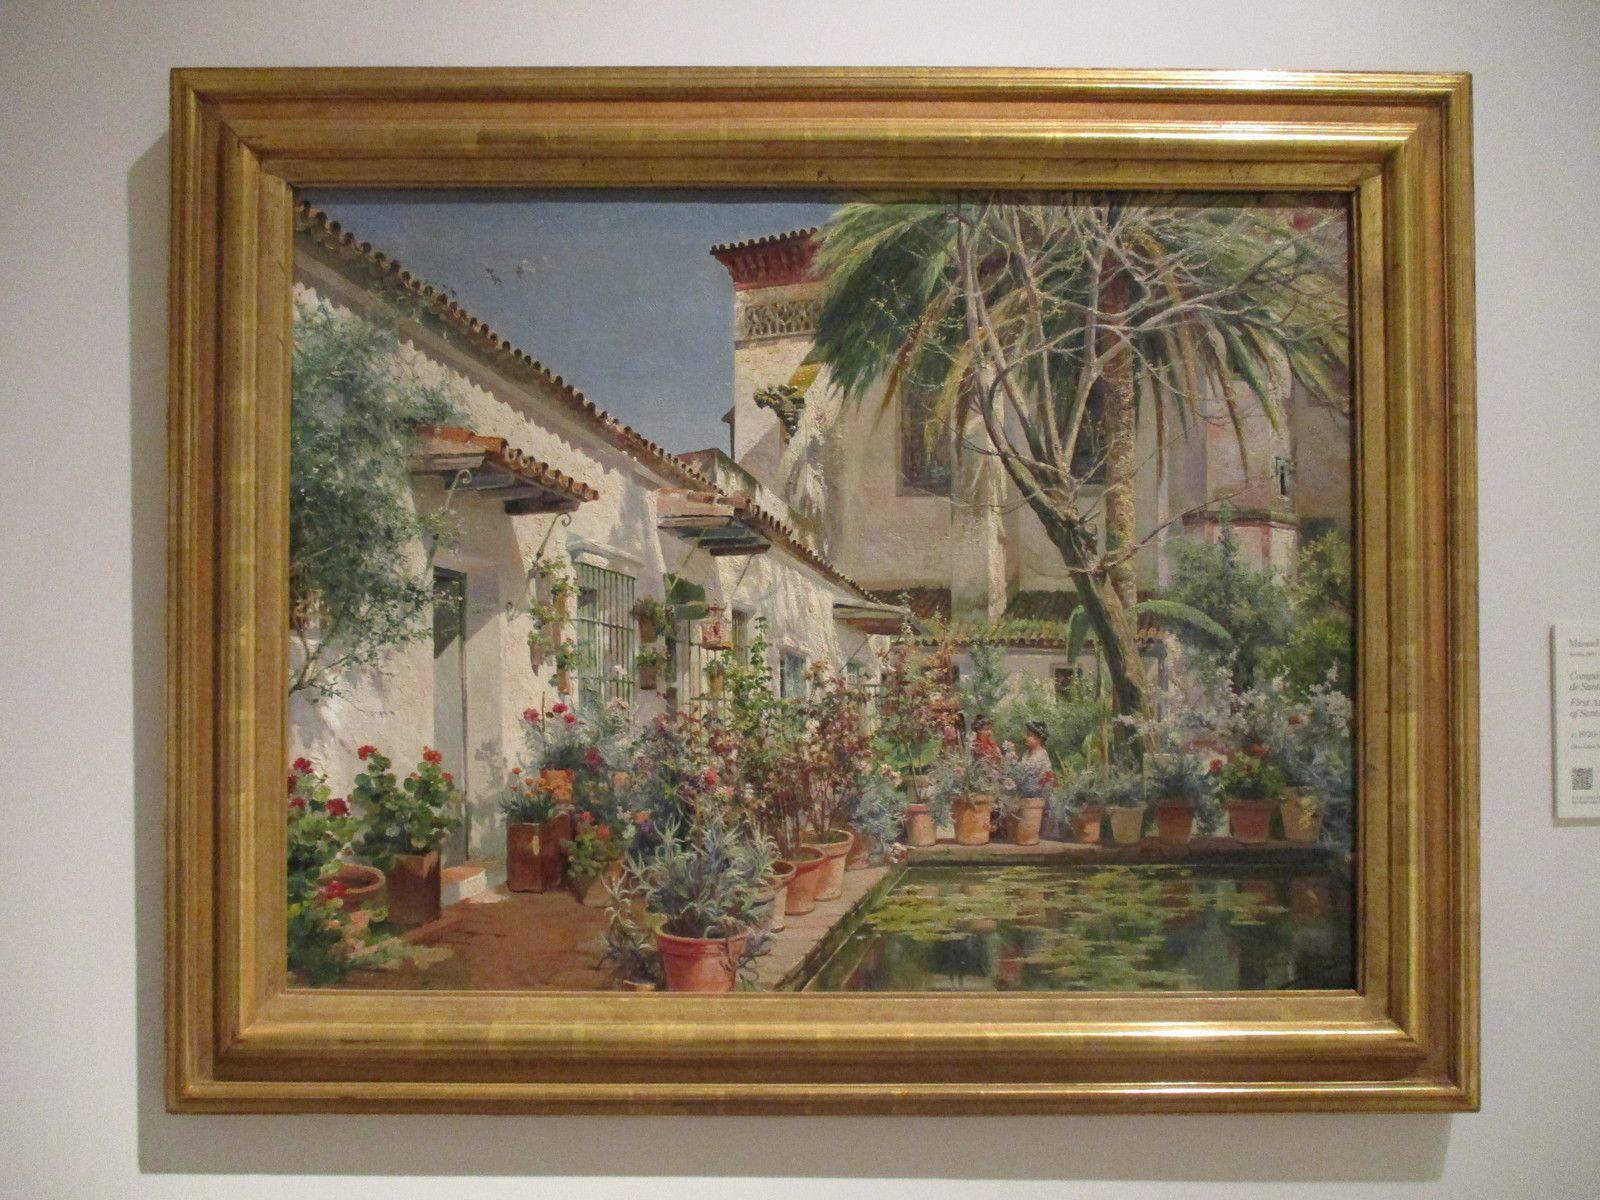 Atrium du Couvent Santa Paula - Manuel Garcia Rodriguez, 1925